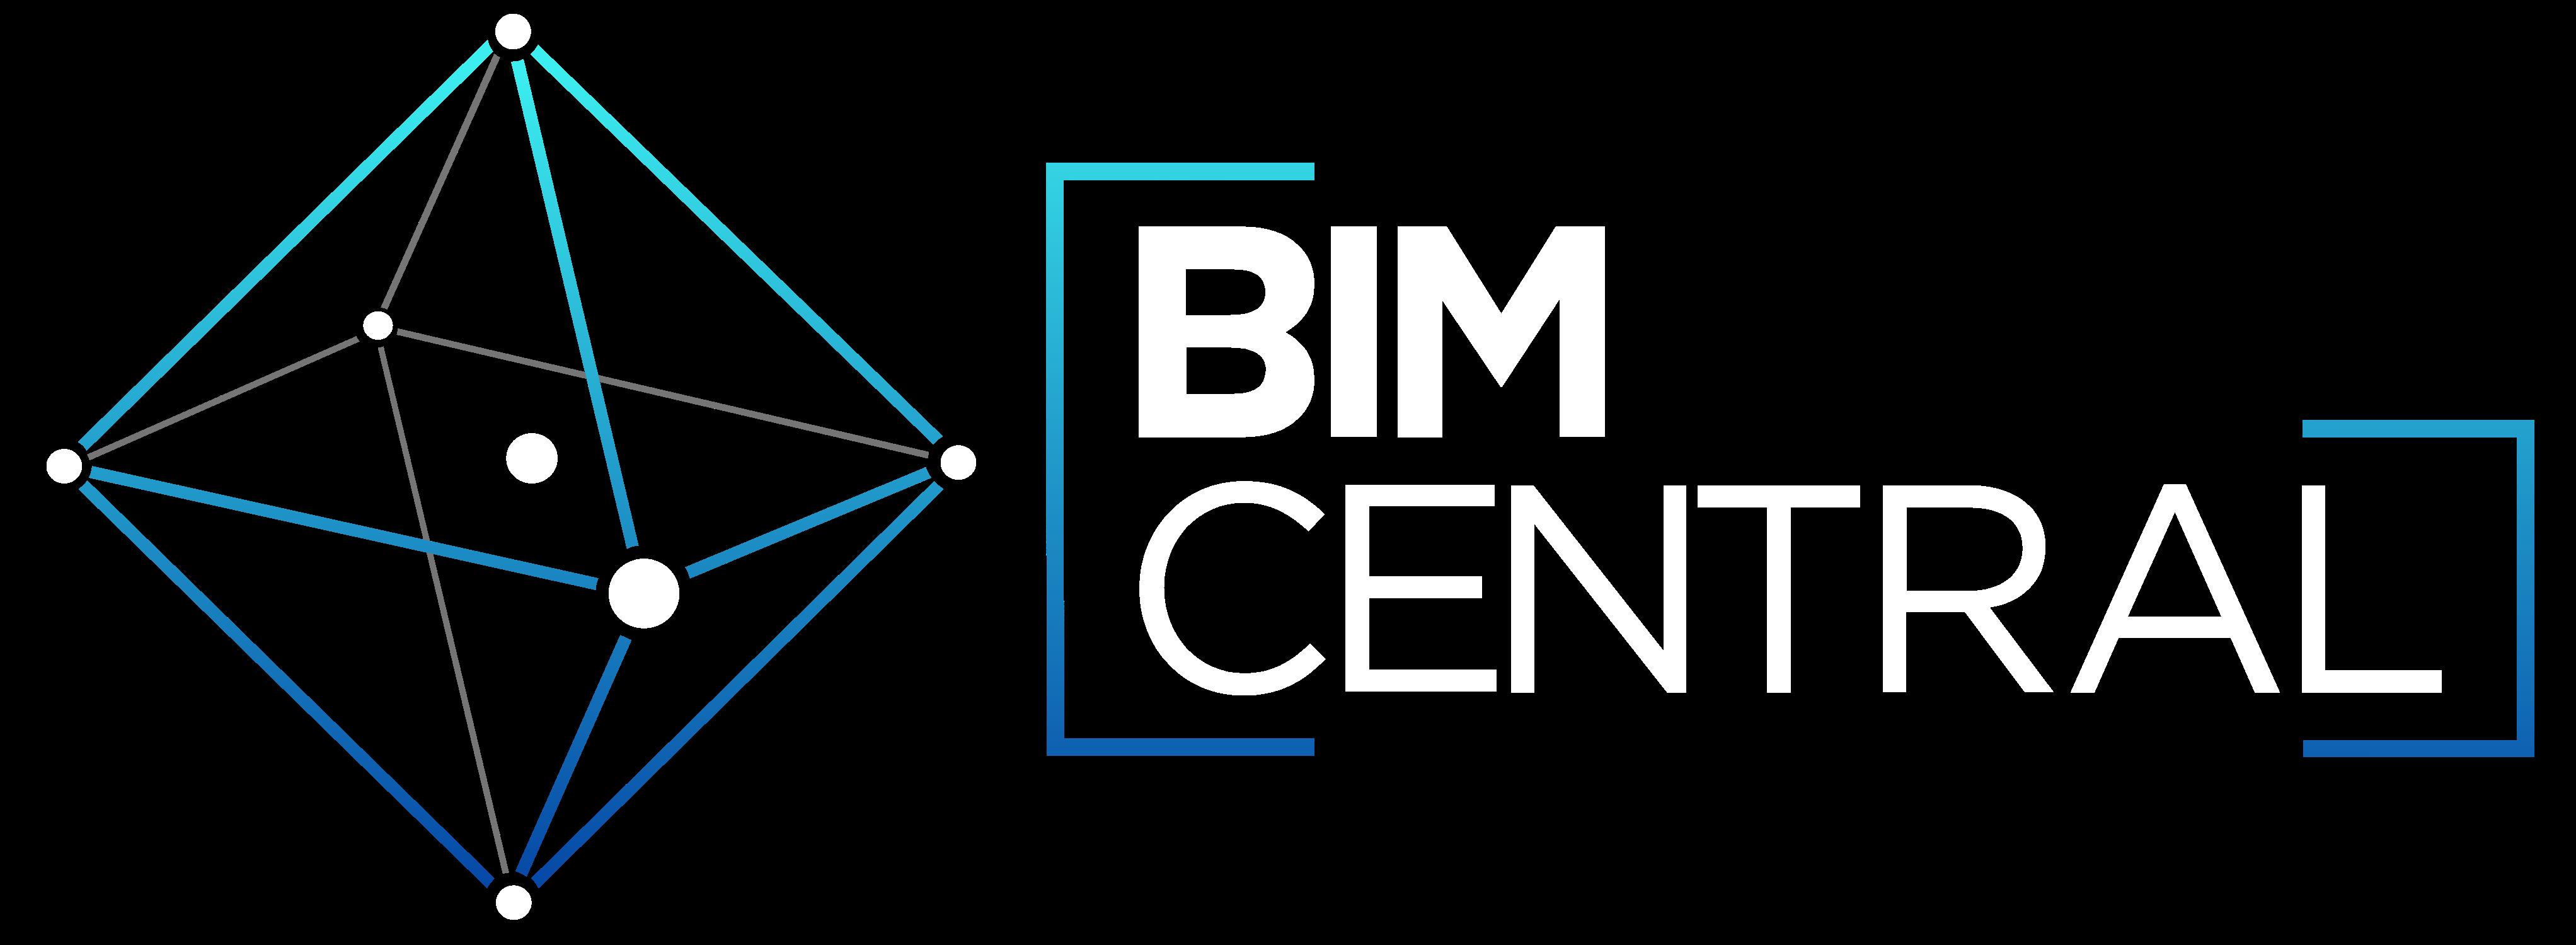 BIM Central